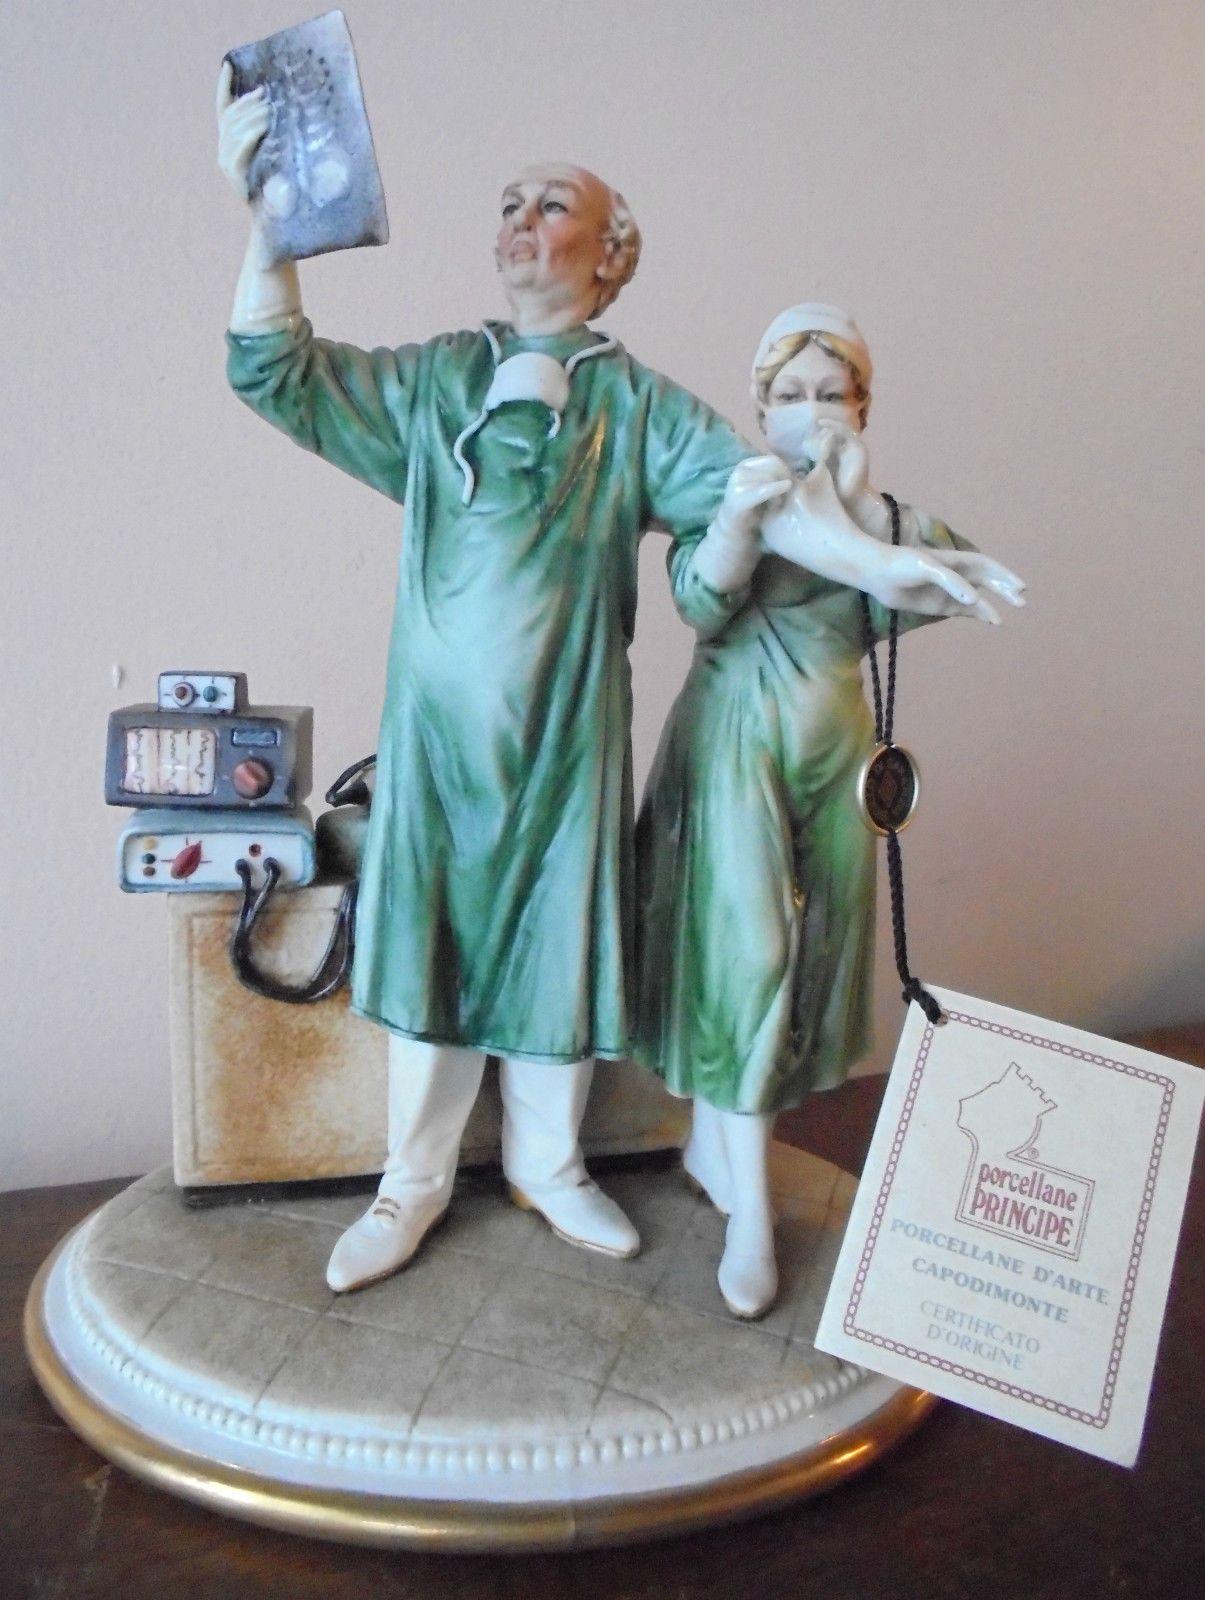 Authentic Porcelain Capodimonte Anaesthetic Surgeon Doctor